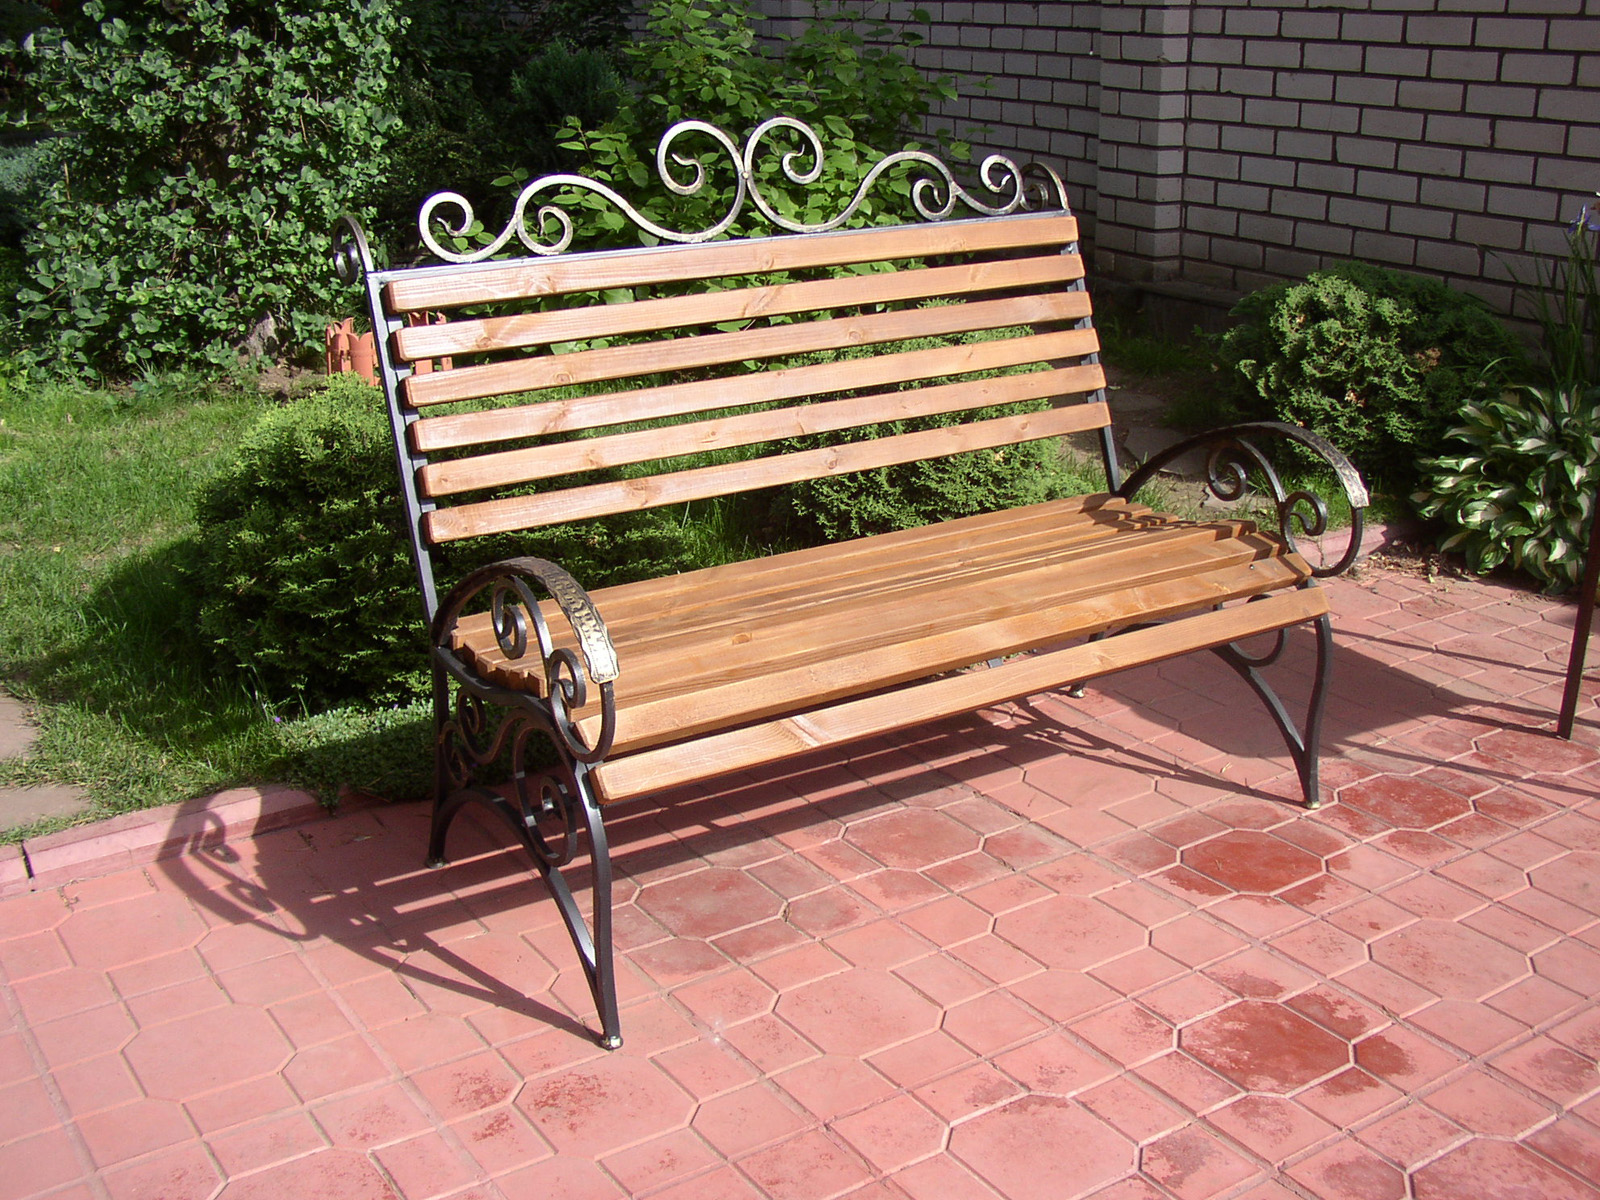 скамейки для сада идеи